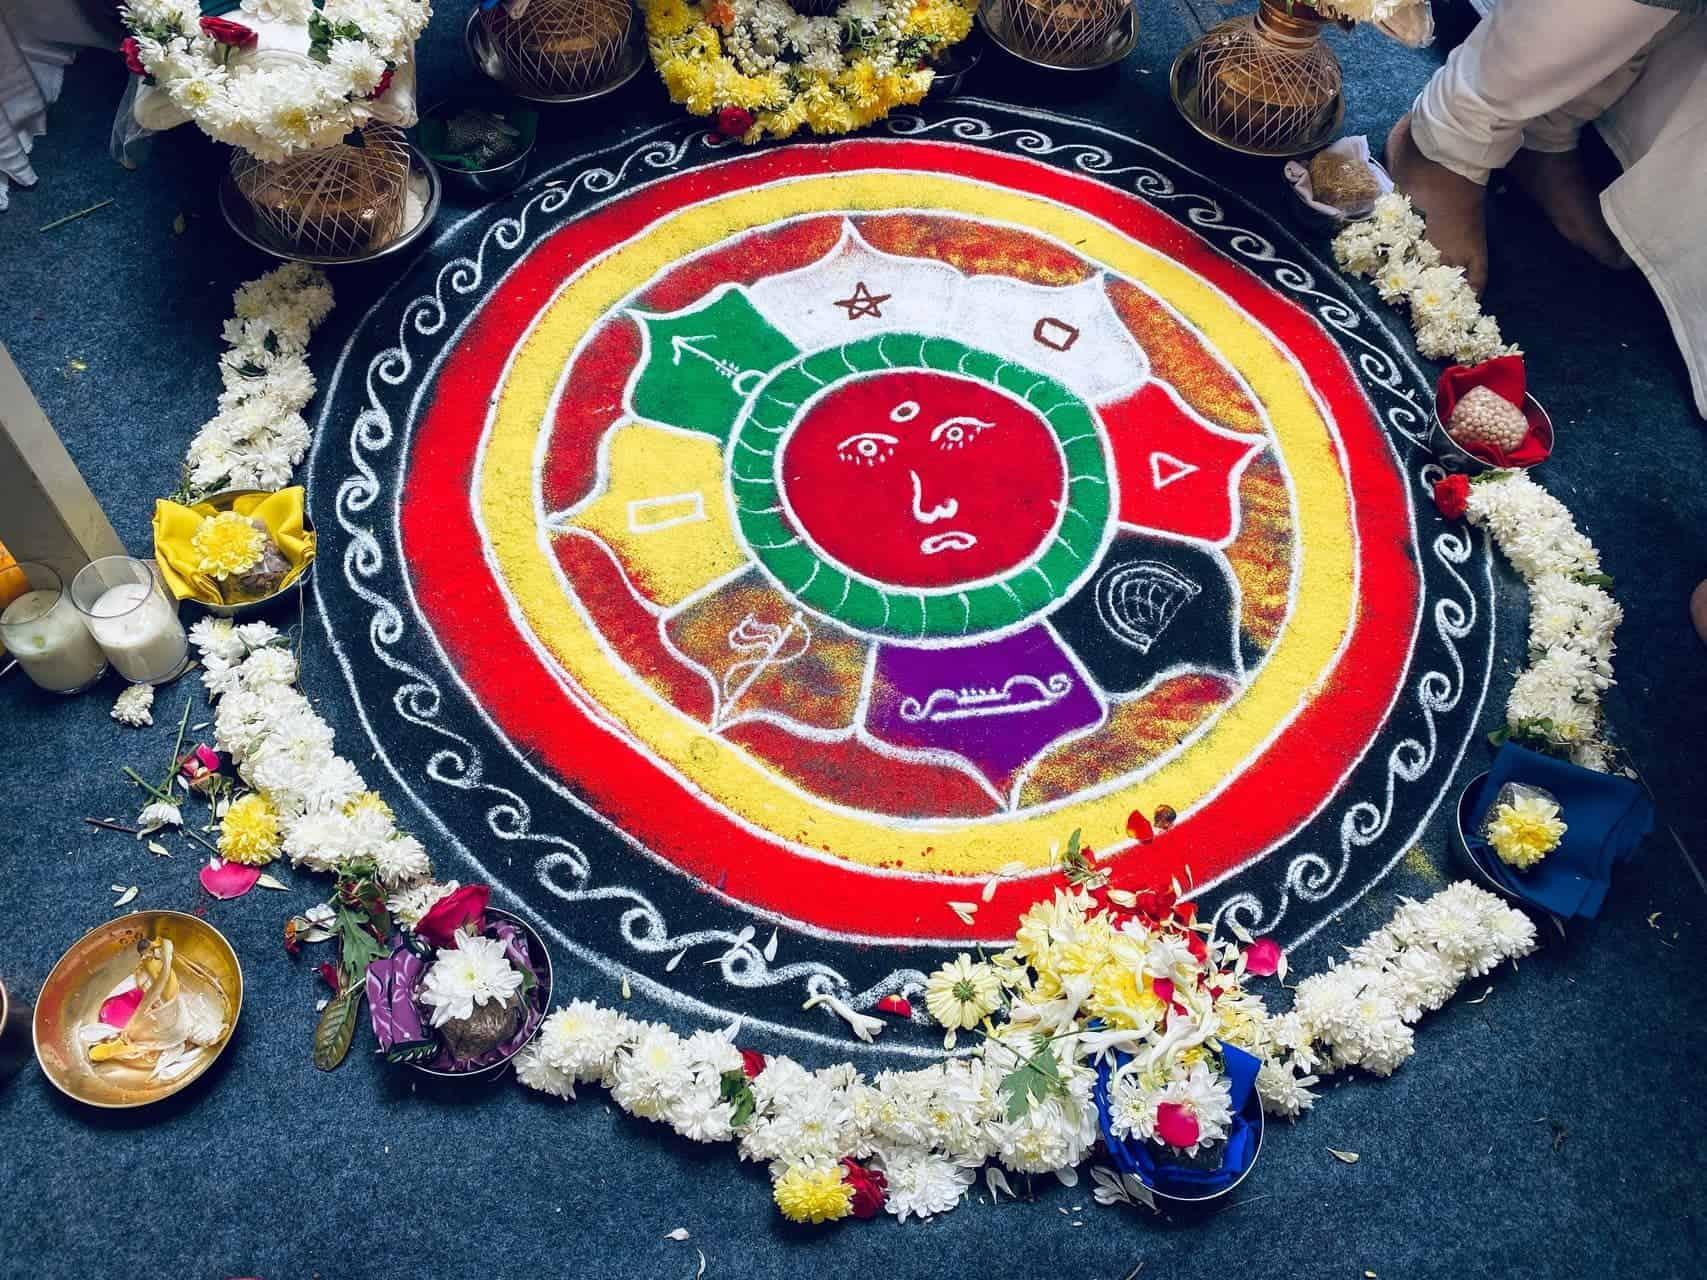 Kolam or rangoli design to propitiate the nine planets or nava graham.